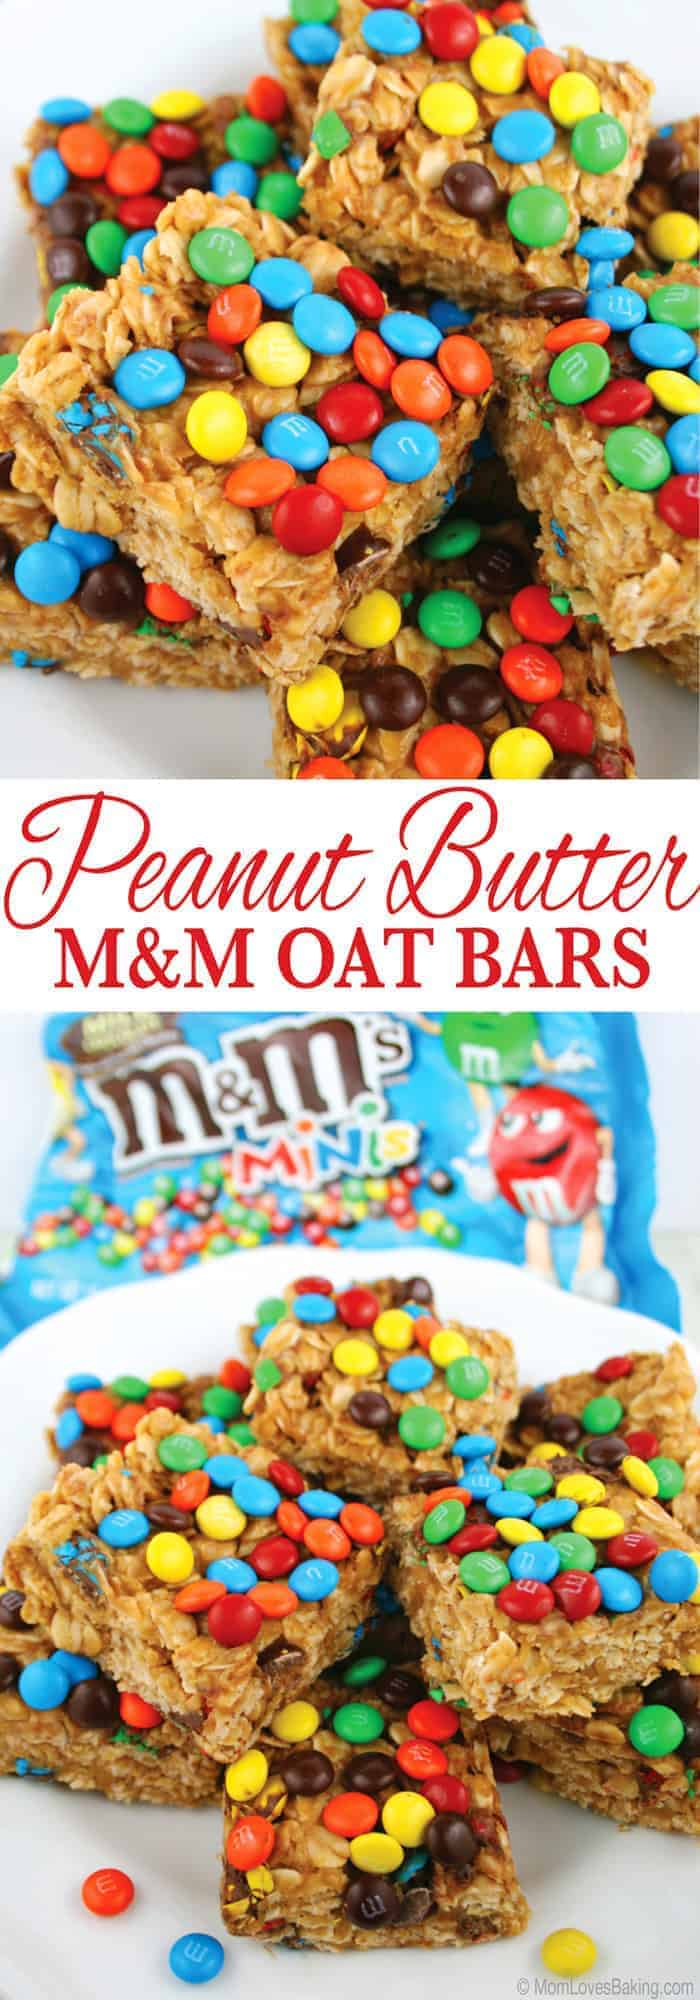 Peanut Butter M&M Oat Bars